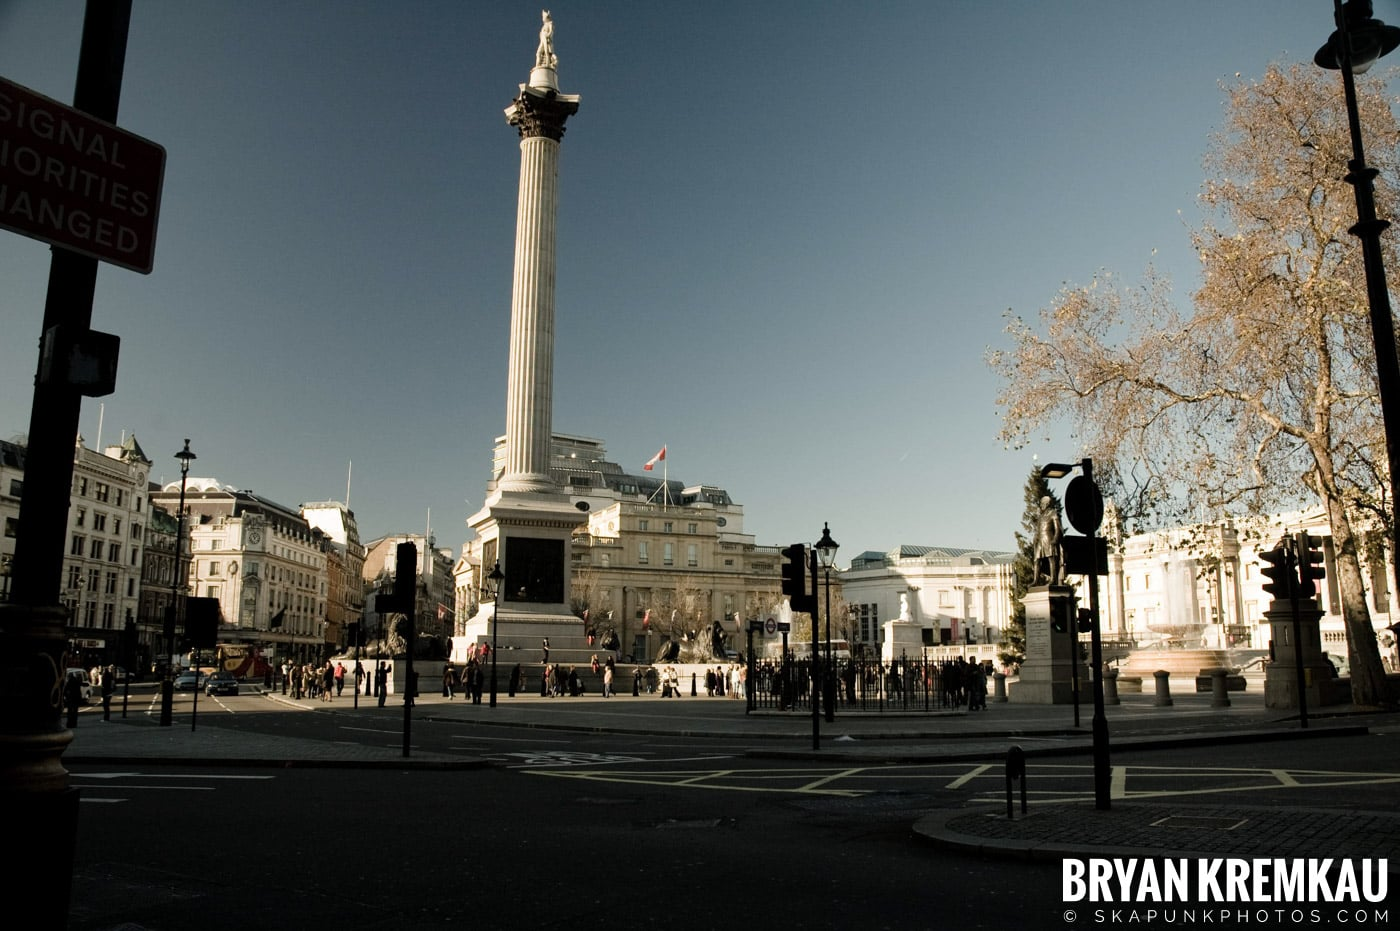 London, England - Day 5 - 12.17.06 (21)